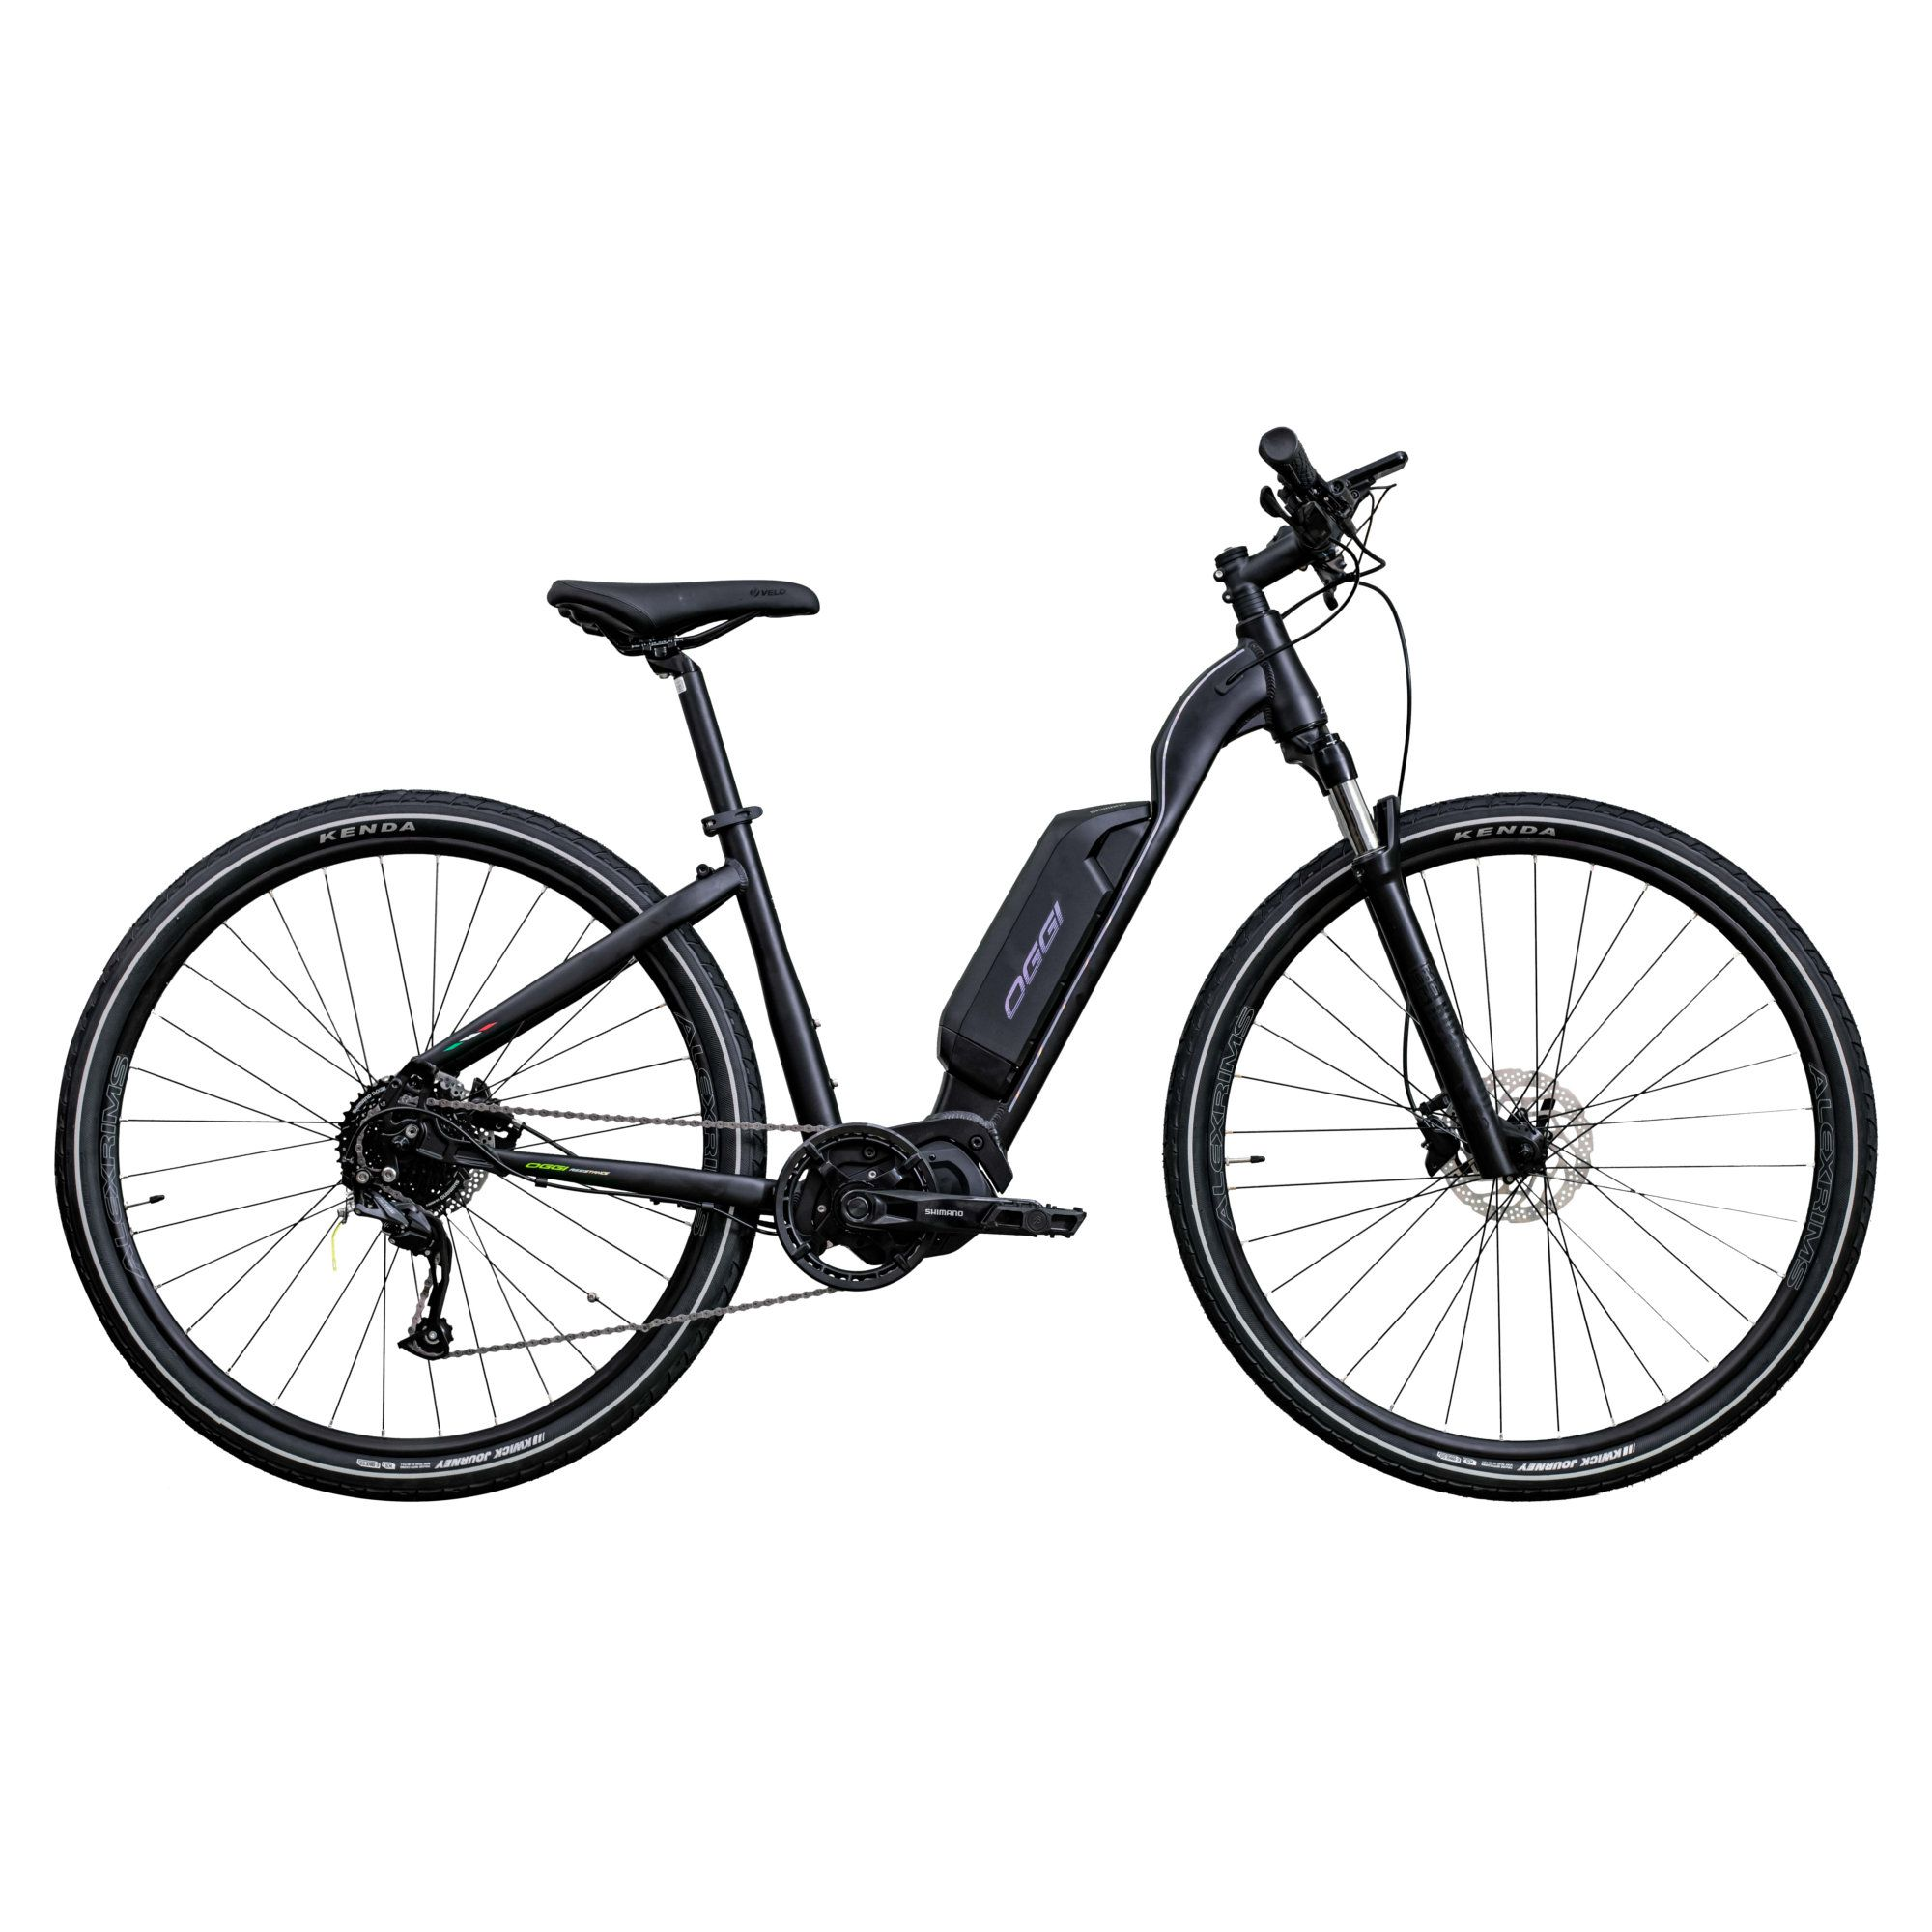 Bicicleta Elétrica Urbana Oggi Flex 700 2020